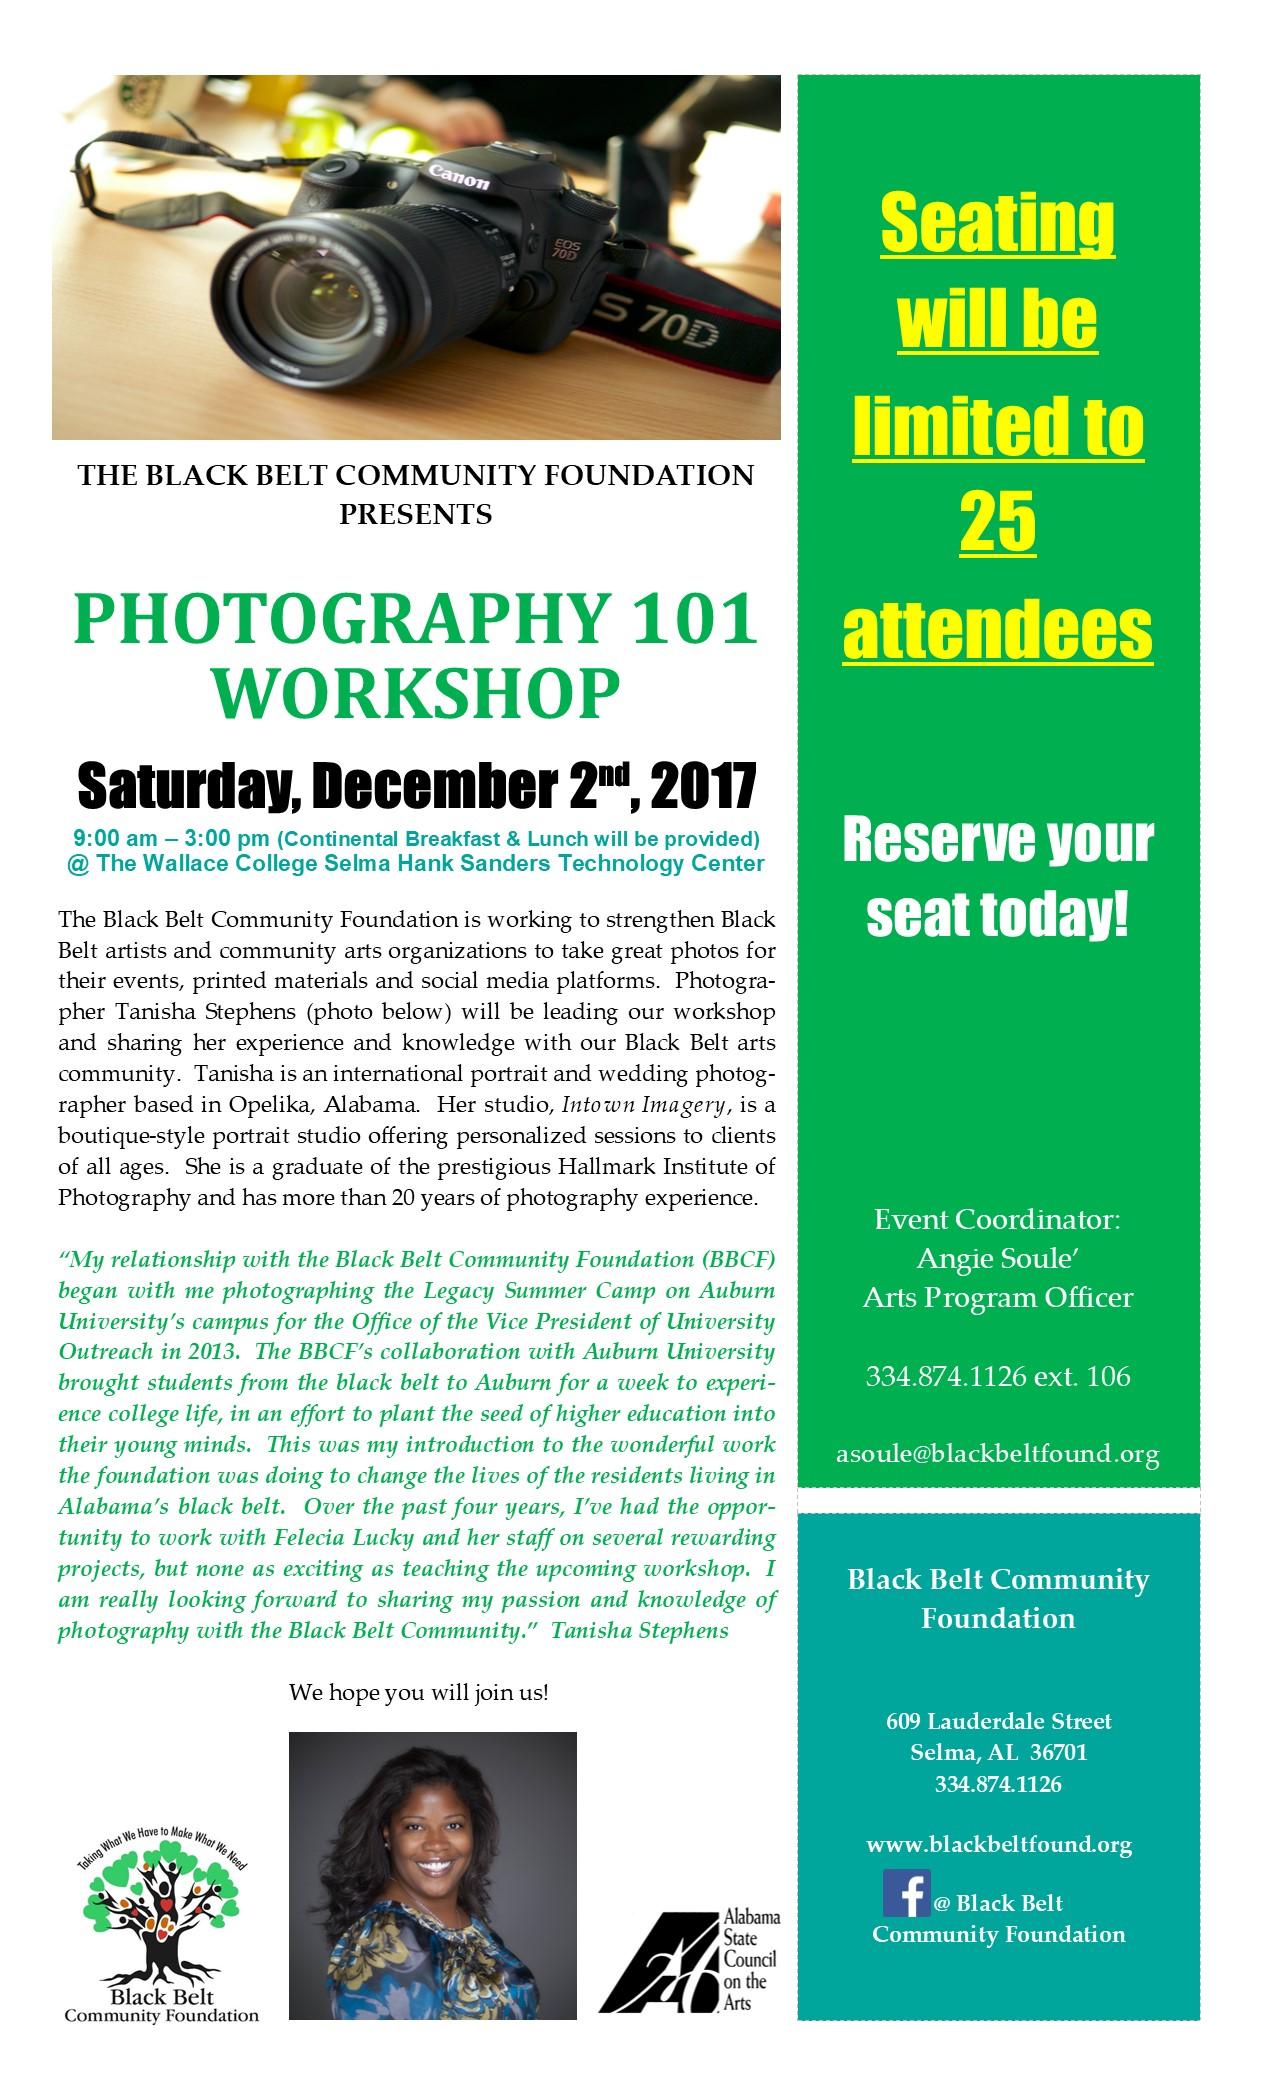 BBCF Photography 101 Workshop Flyer